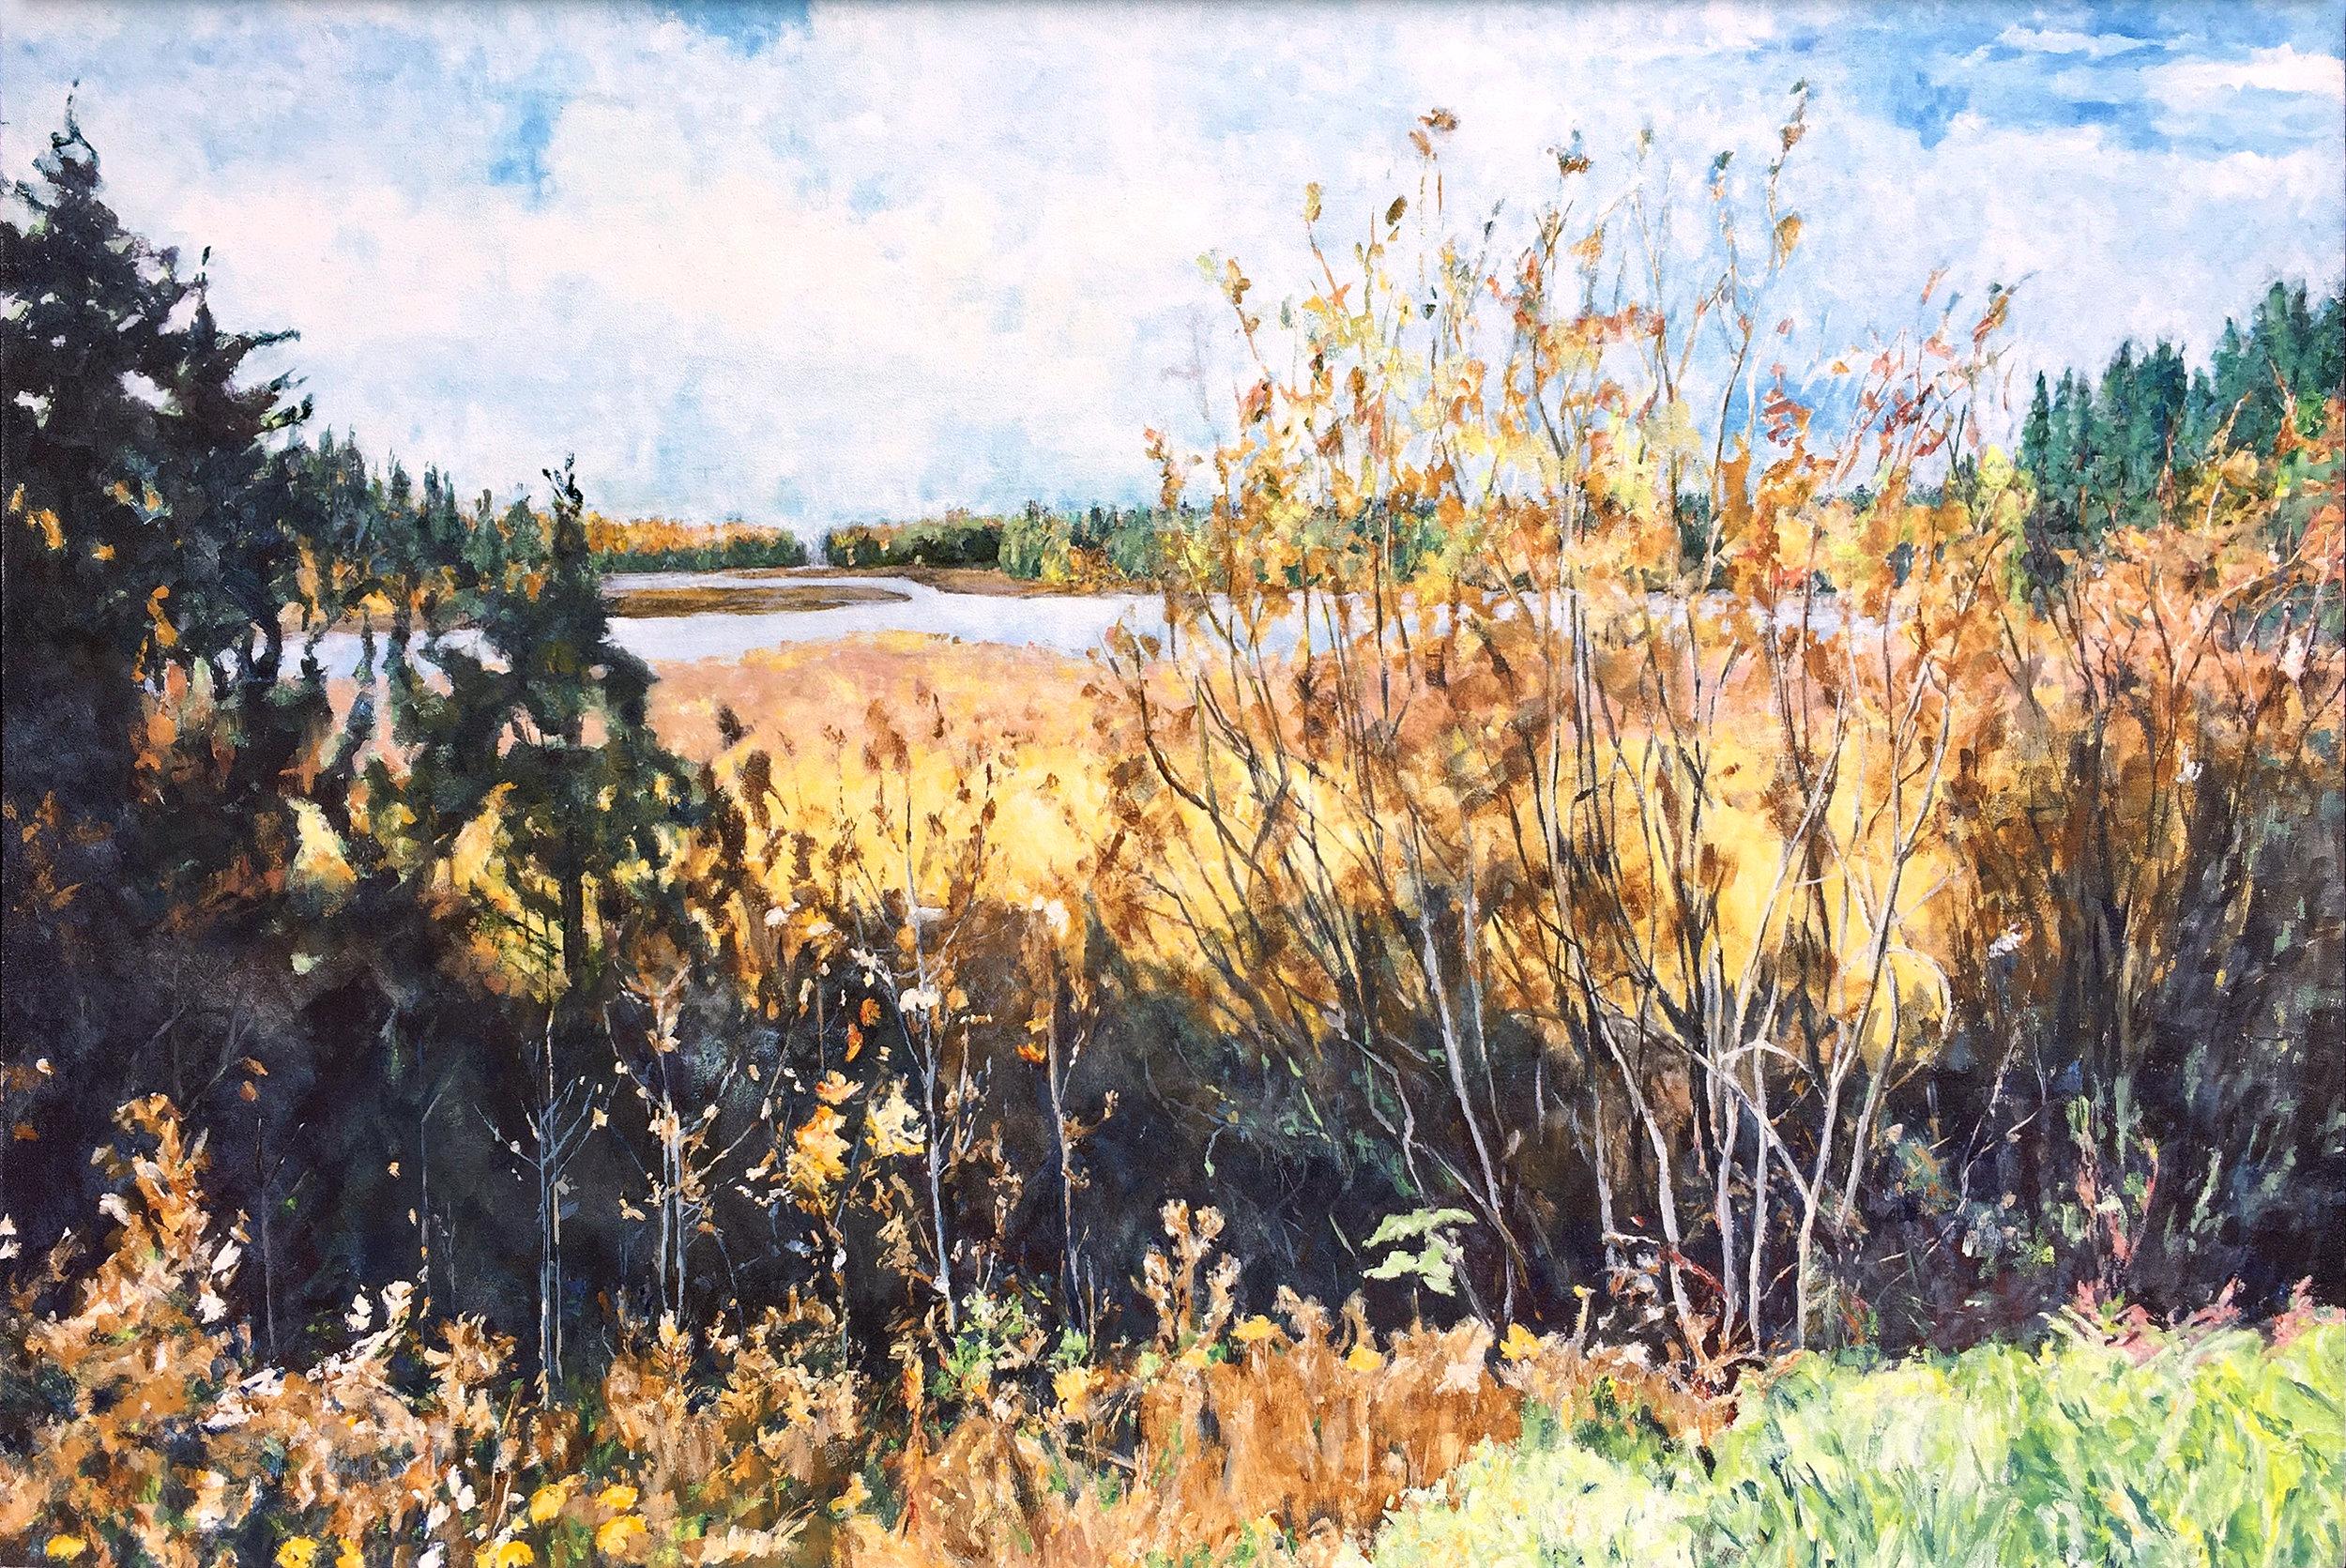 Dark Shadows, Spruce River Reservoir (AC-006-99), 1999, 48 x 72 inches, Acrylic on canvas